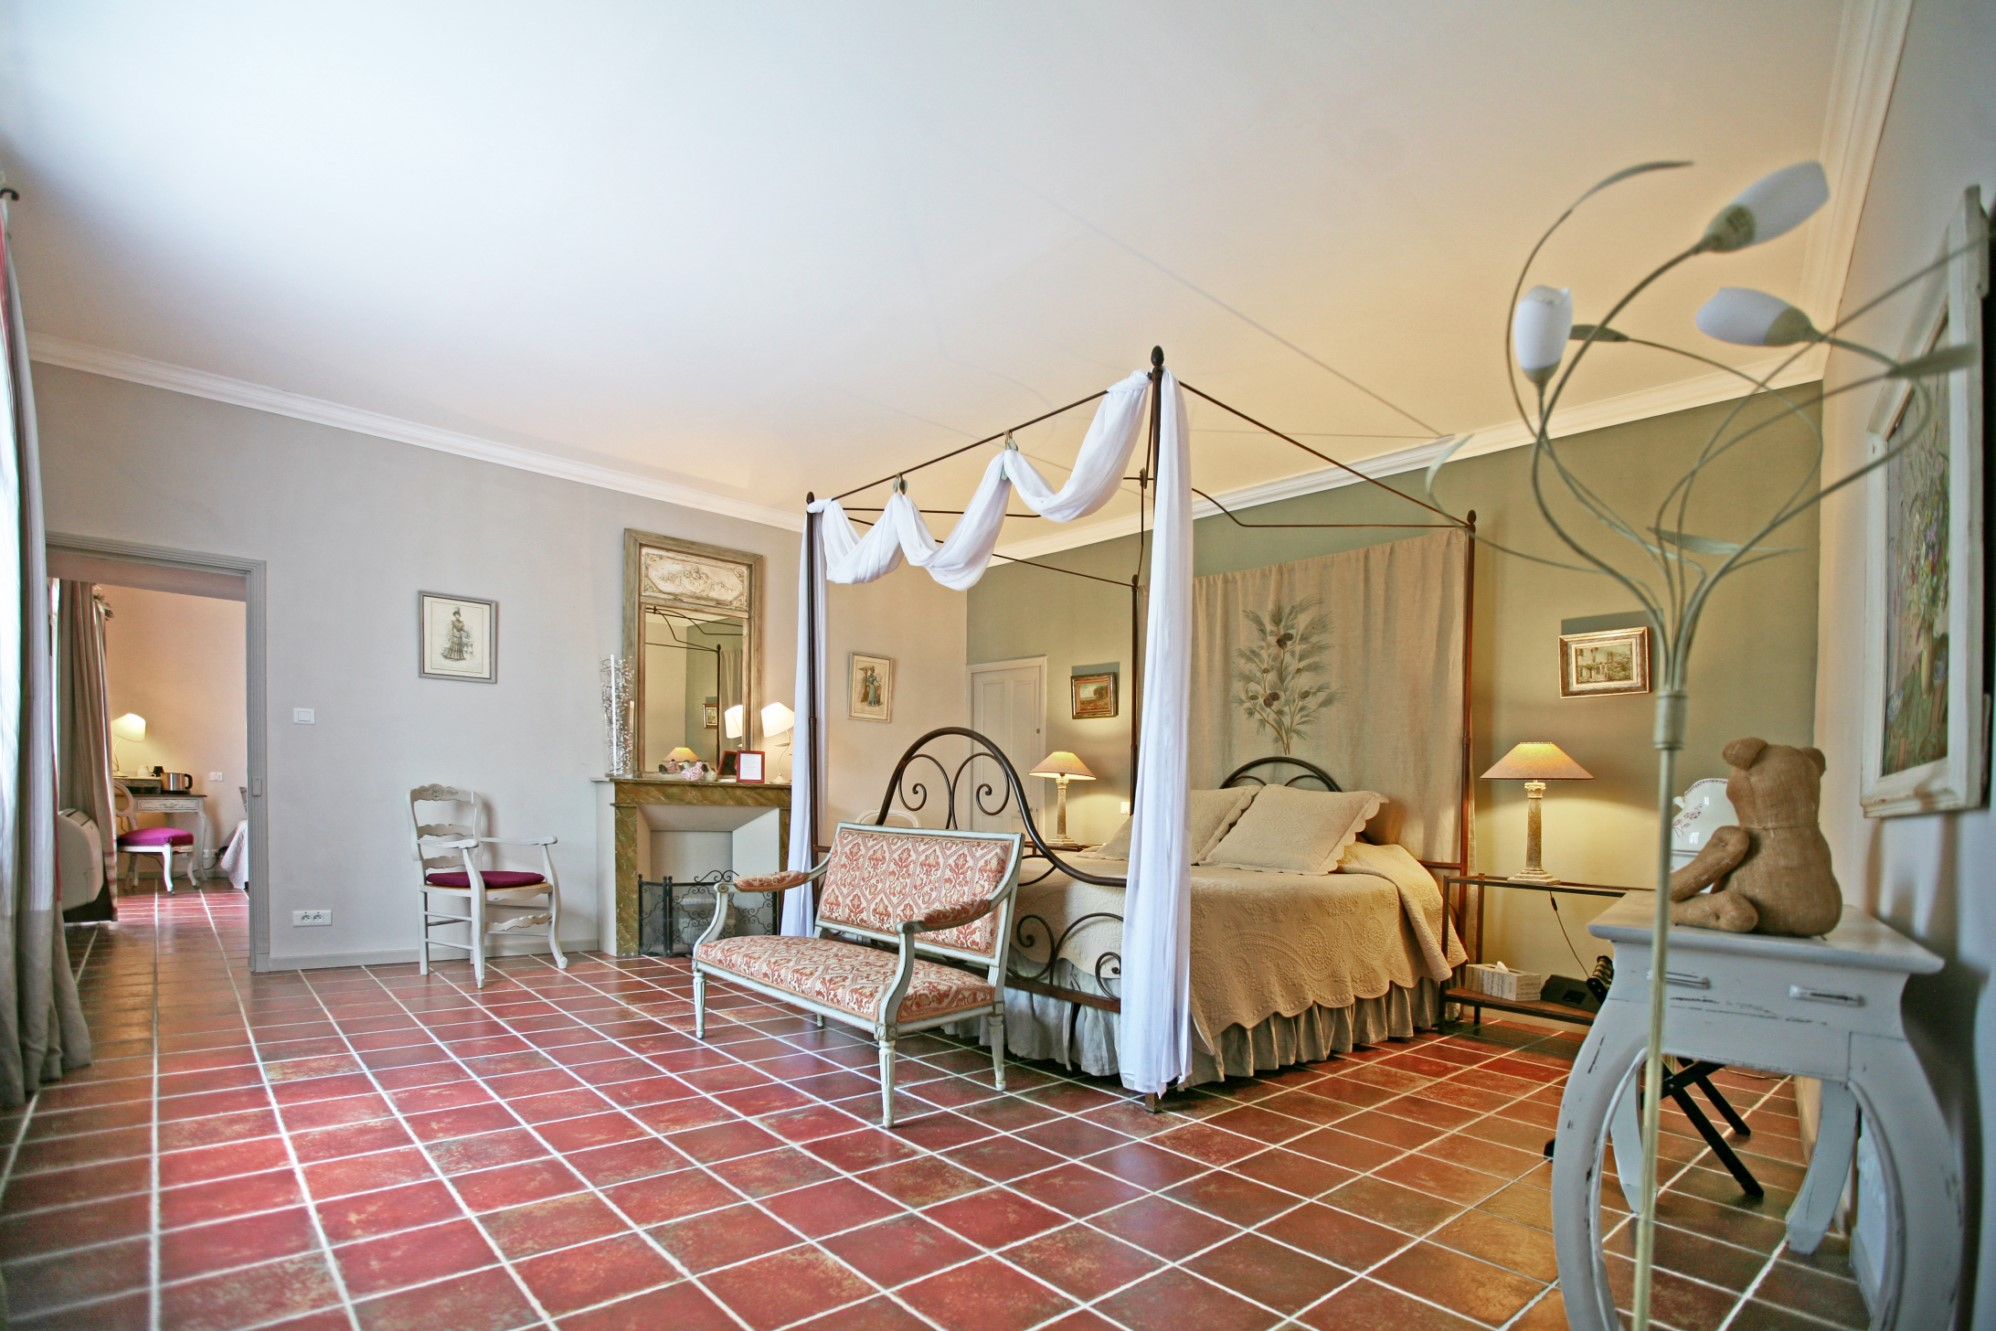 Bastide provençale avec grand jardin et piscine à vendre en Provence